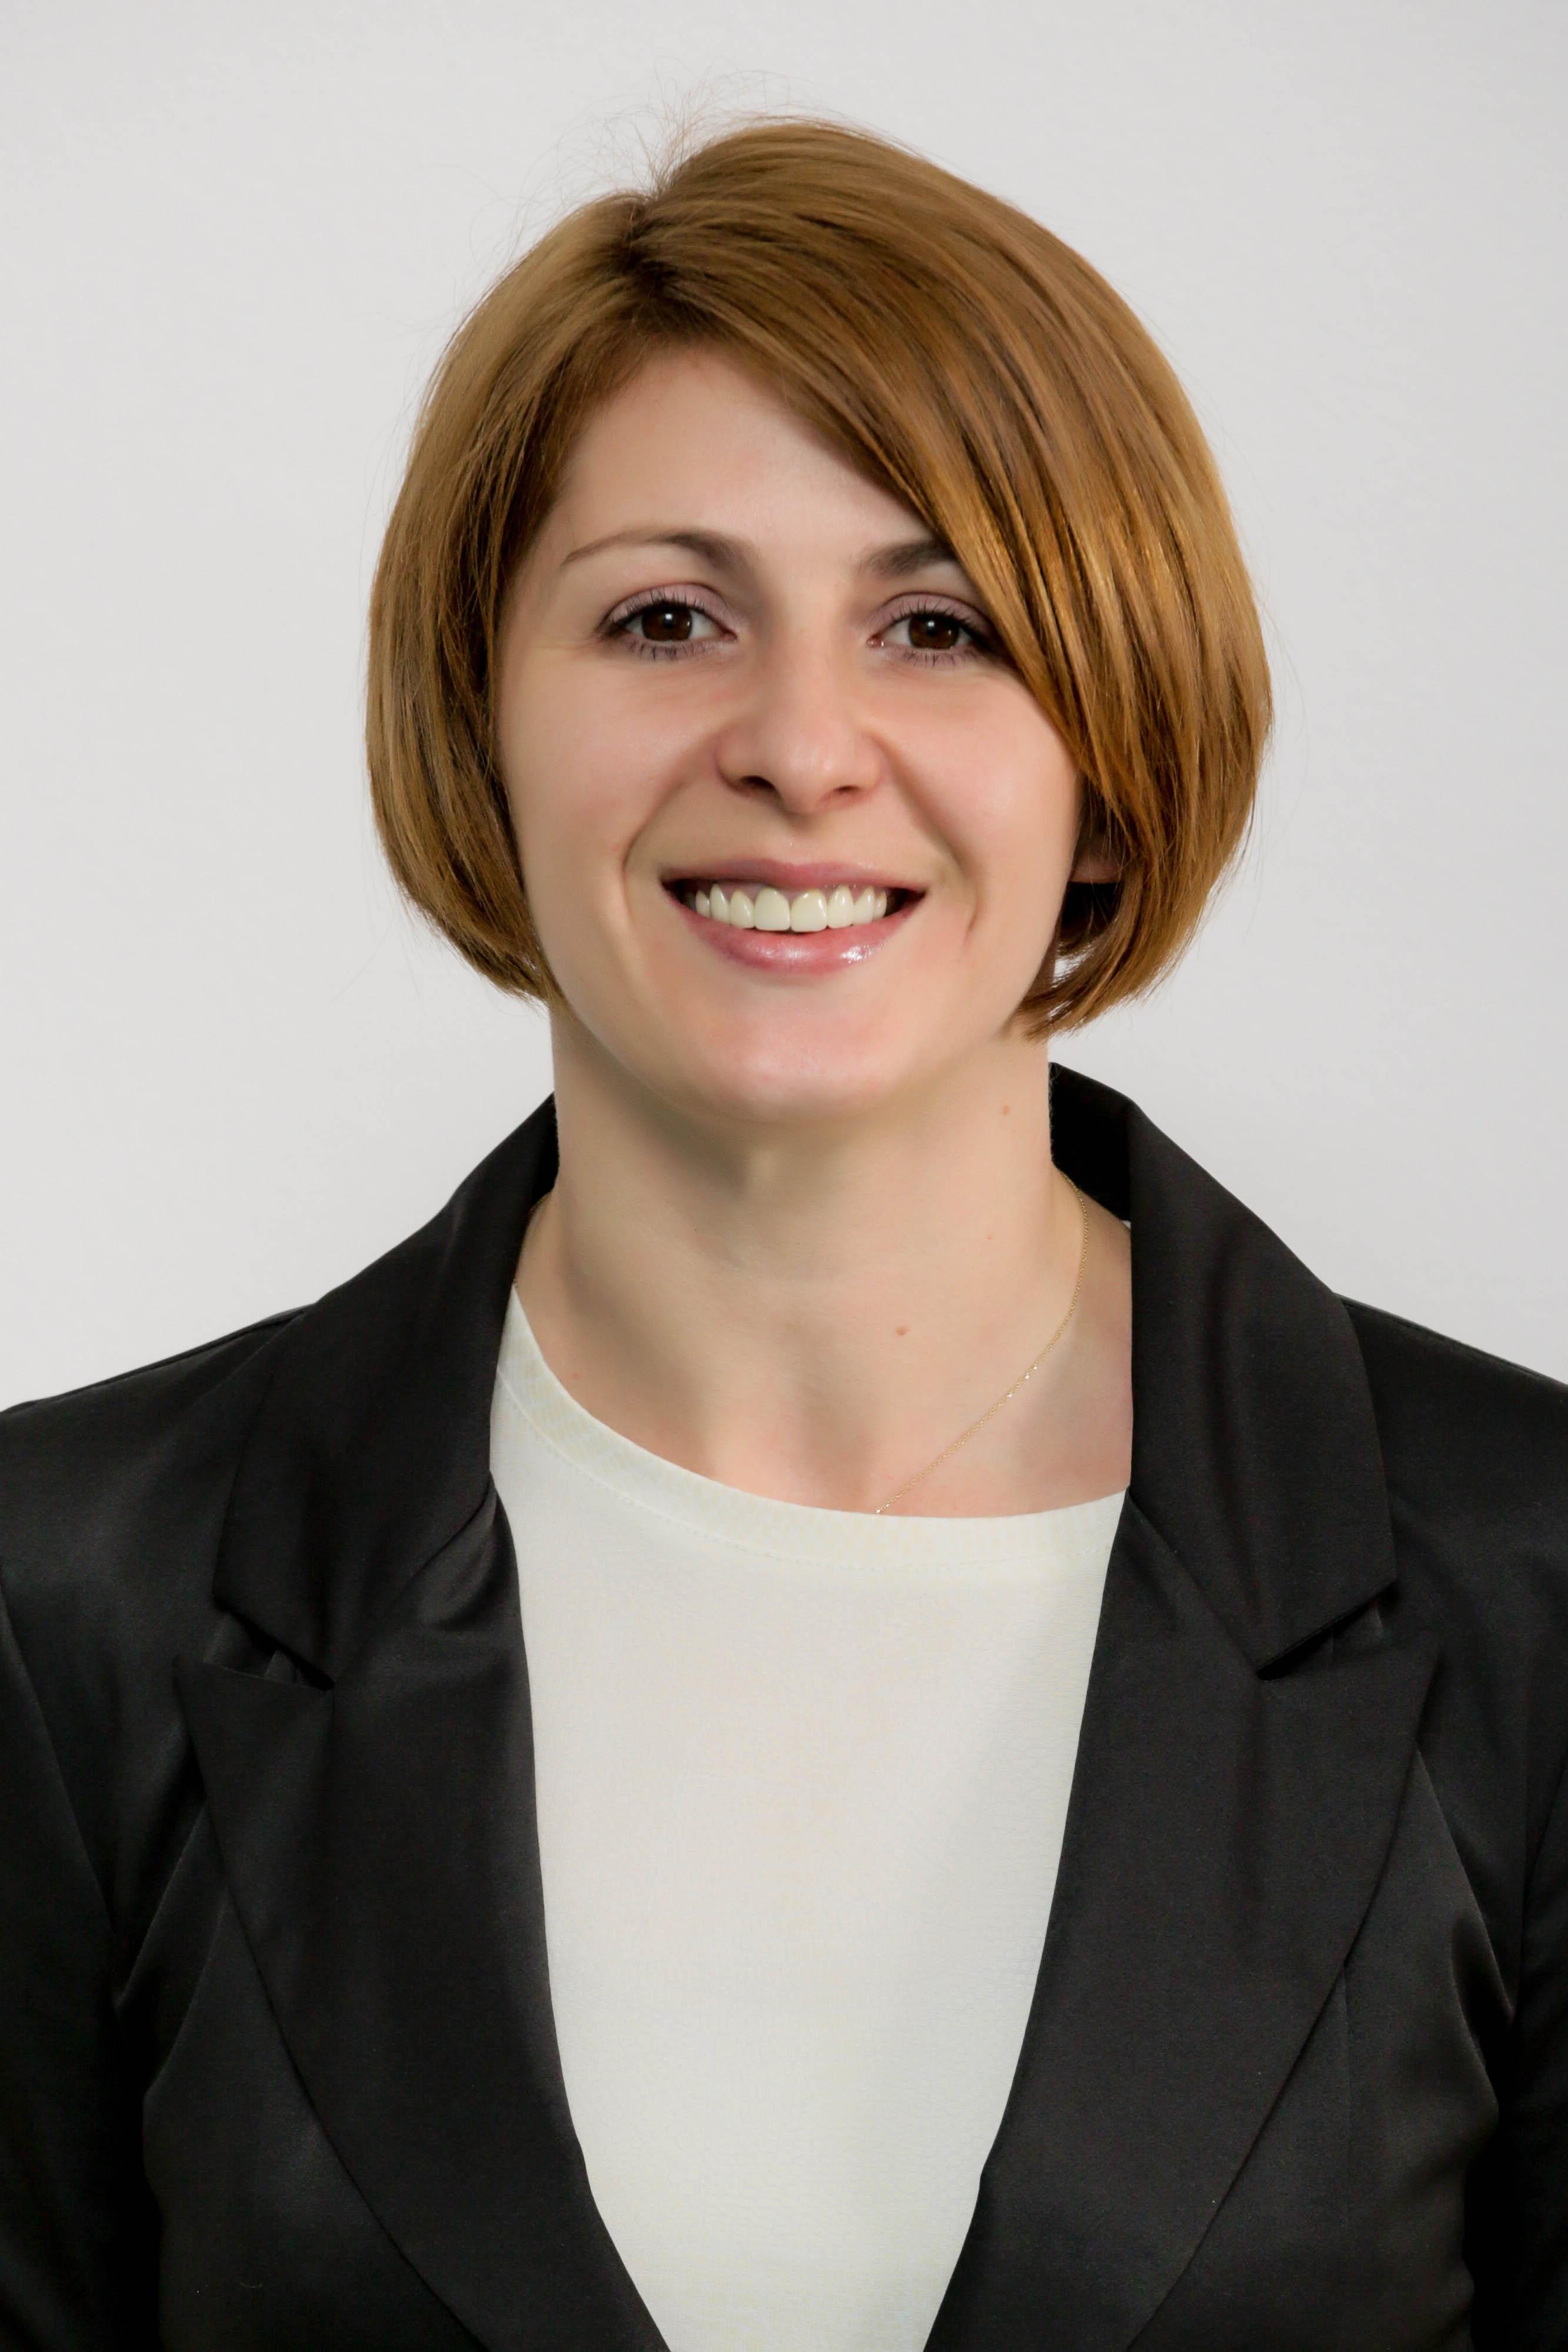 Kadra - mgr Katarzyna Tarłowska-Myszyńska